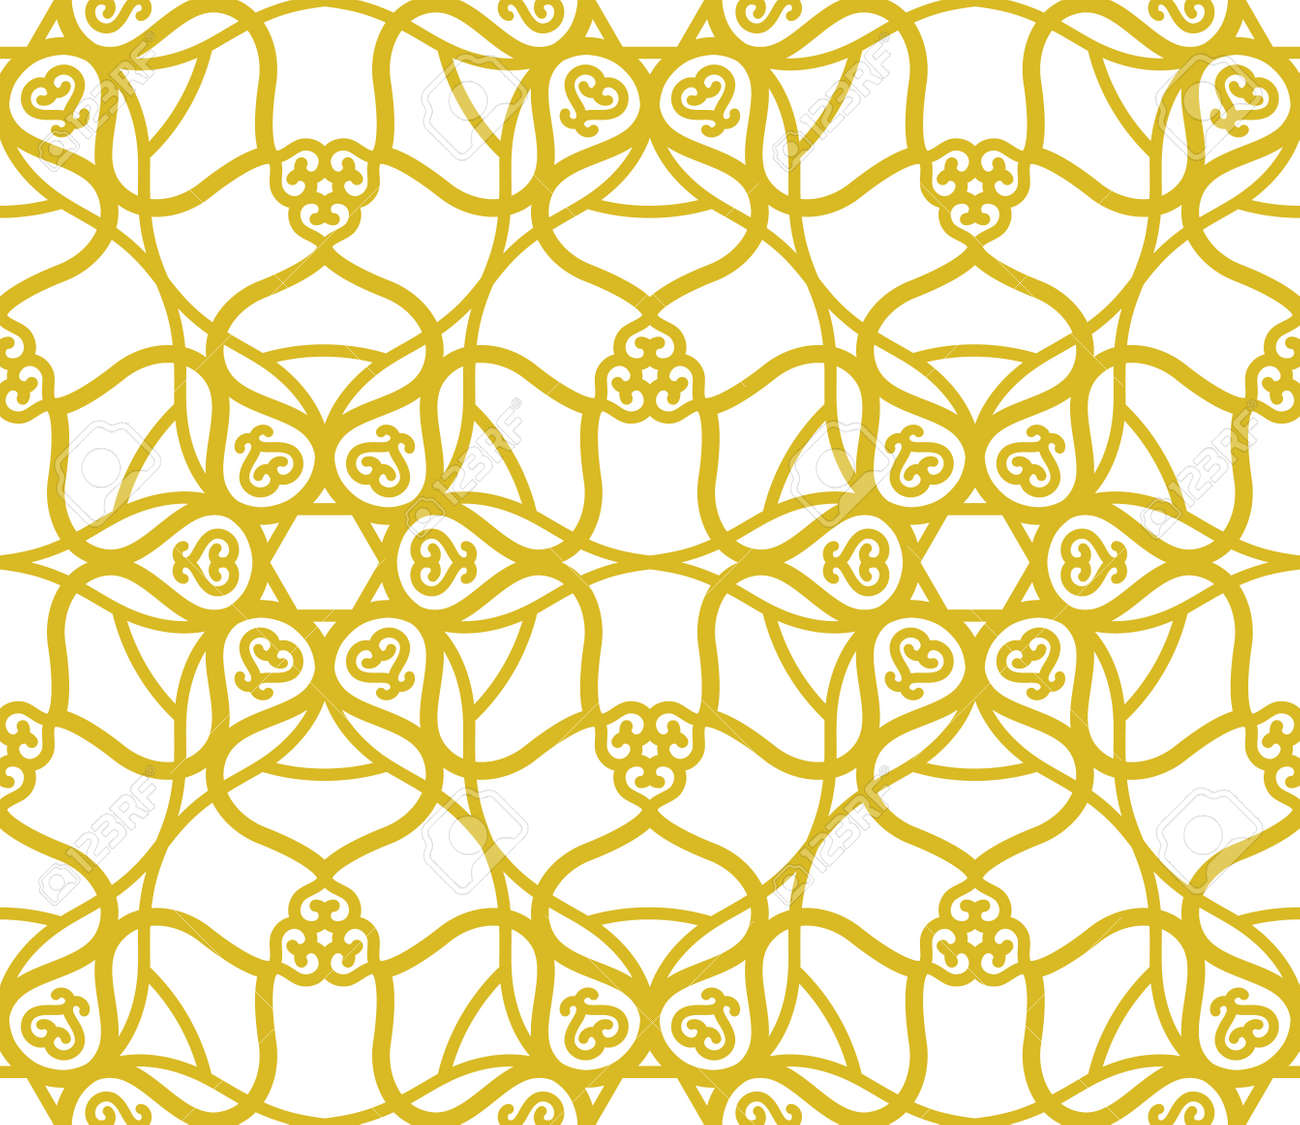 Arabic muslim golden pattern with ramadan islam floral motif - 171052332